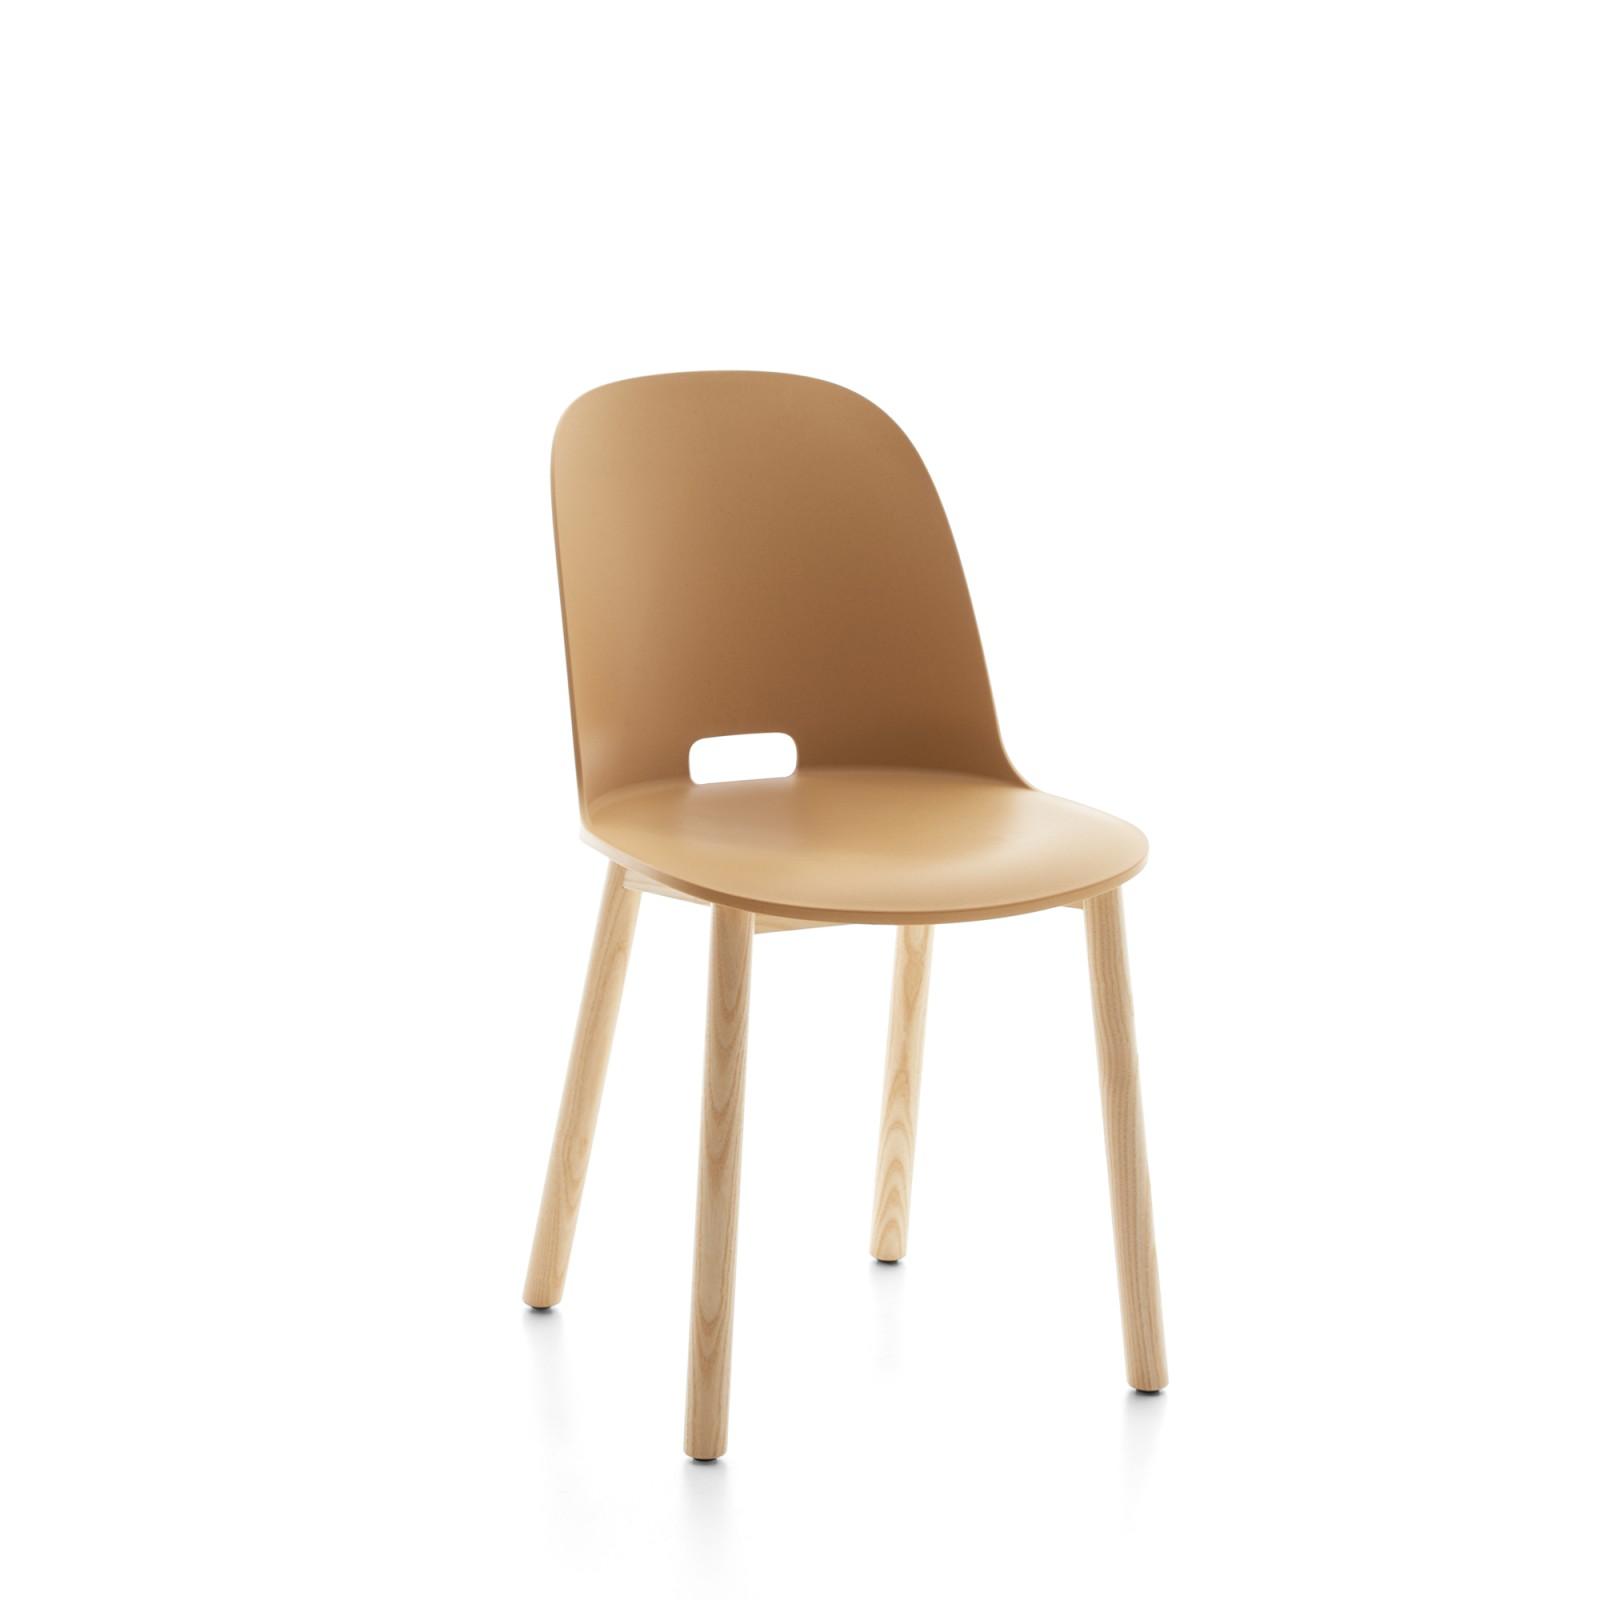 Alfi Chair, High Back Sand, Natural Light Ash Frame